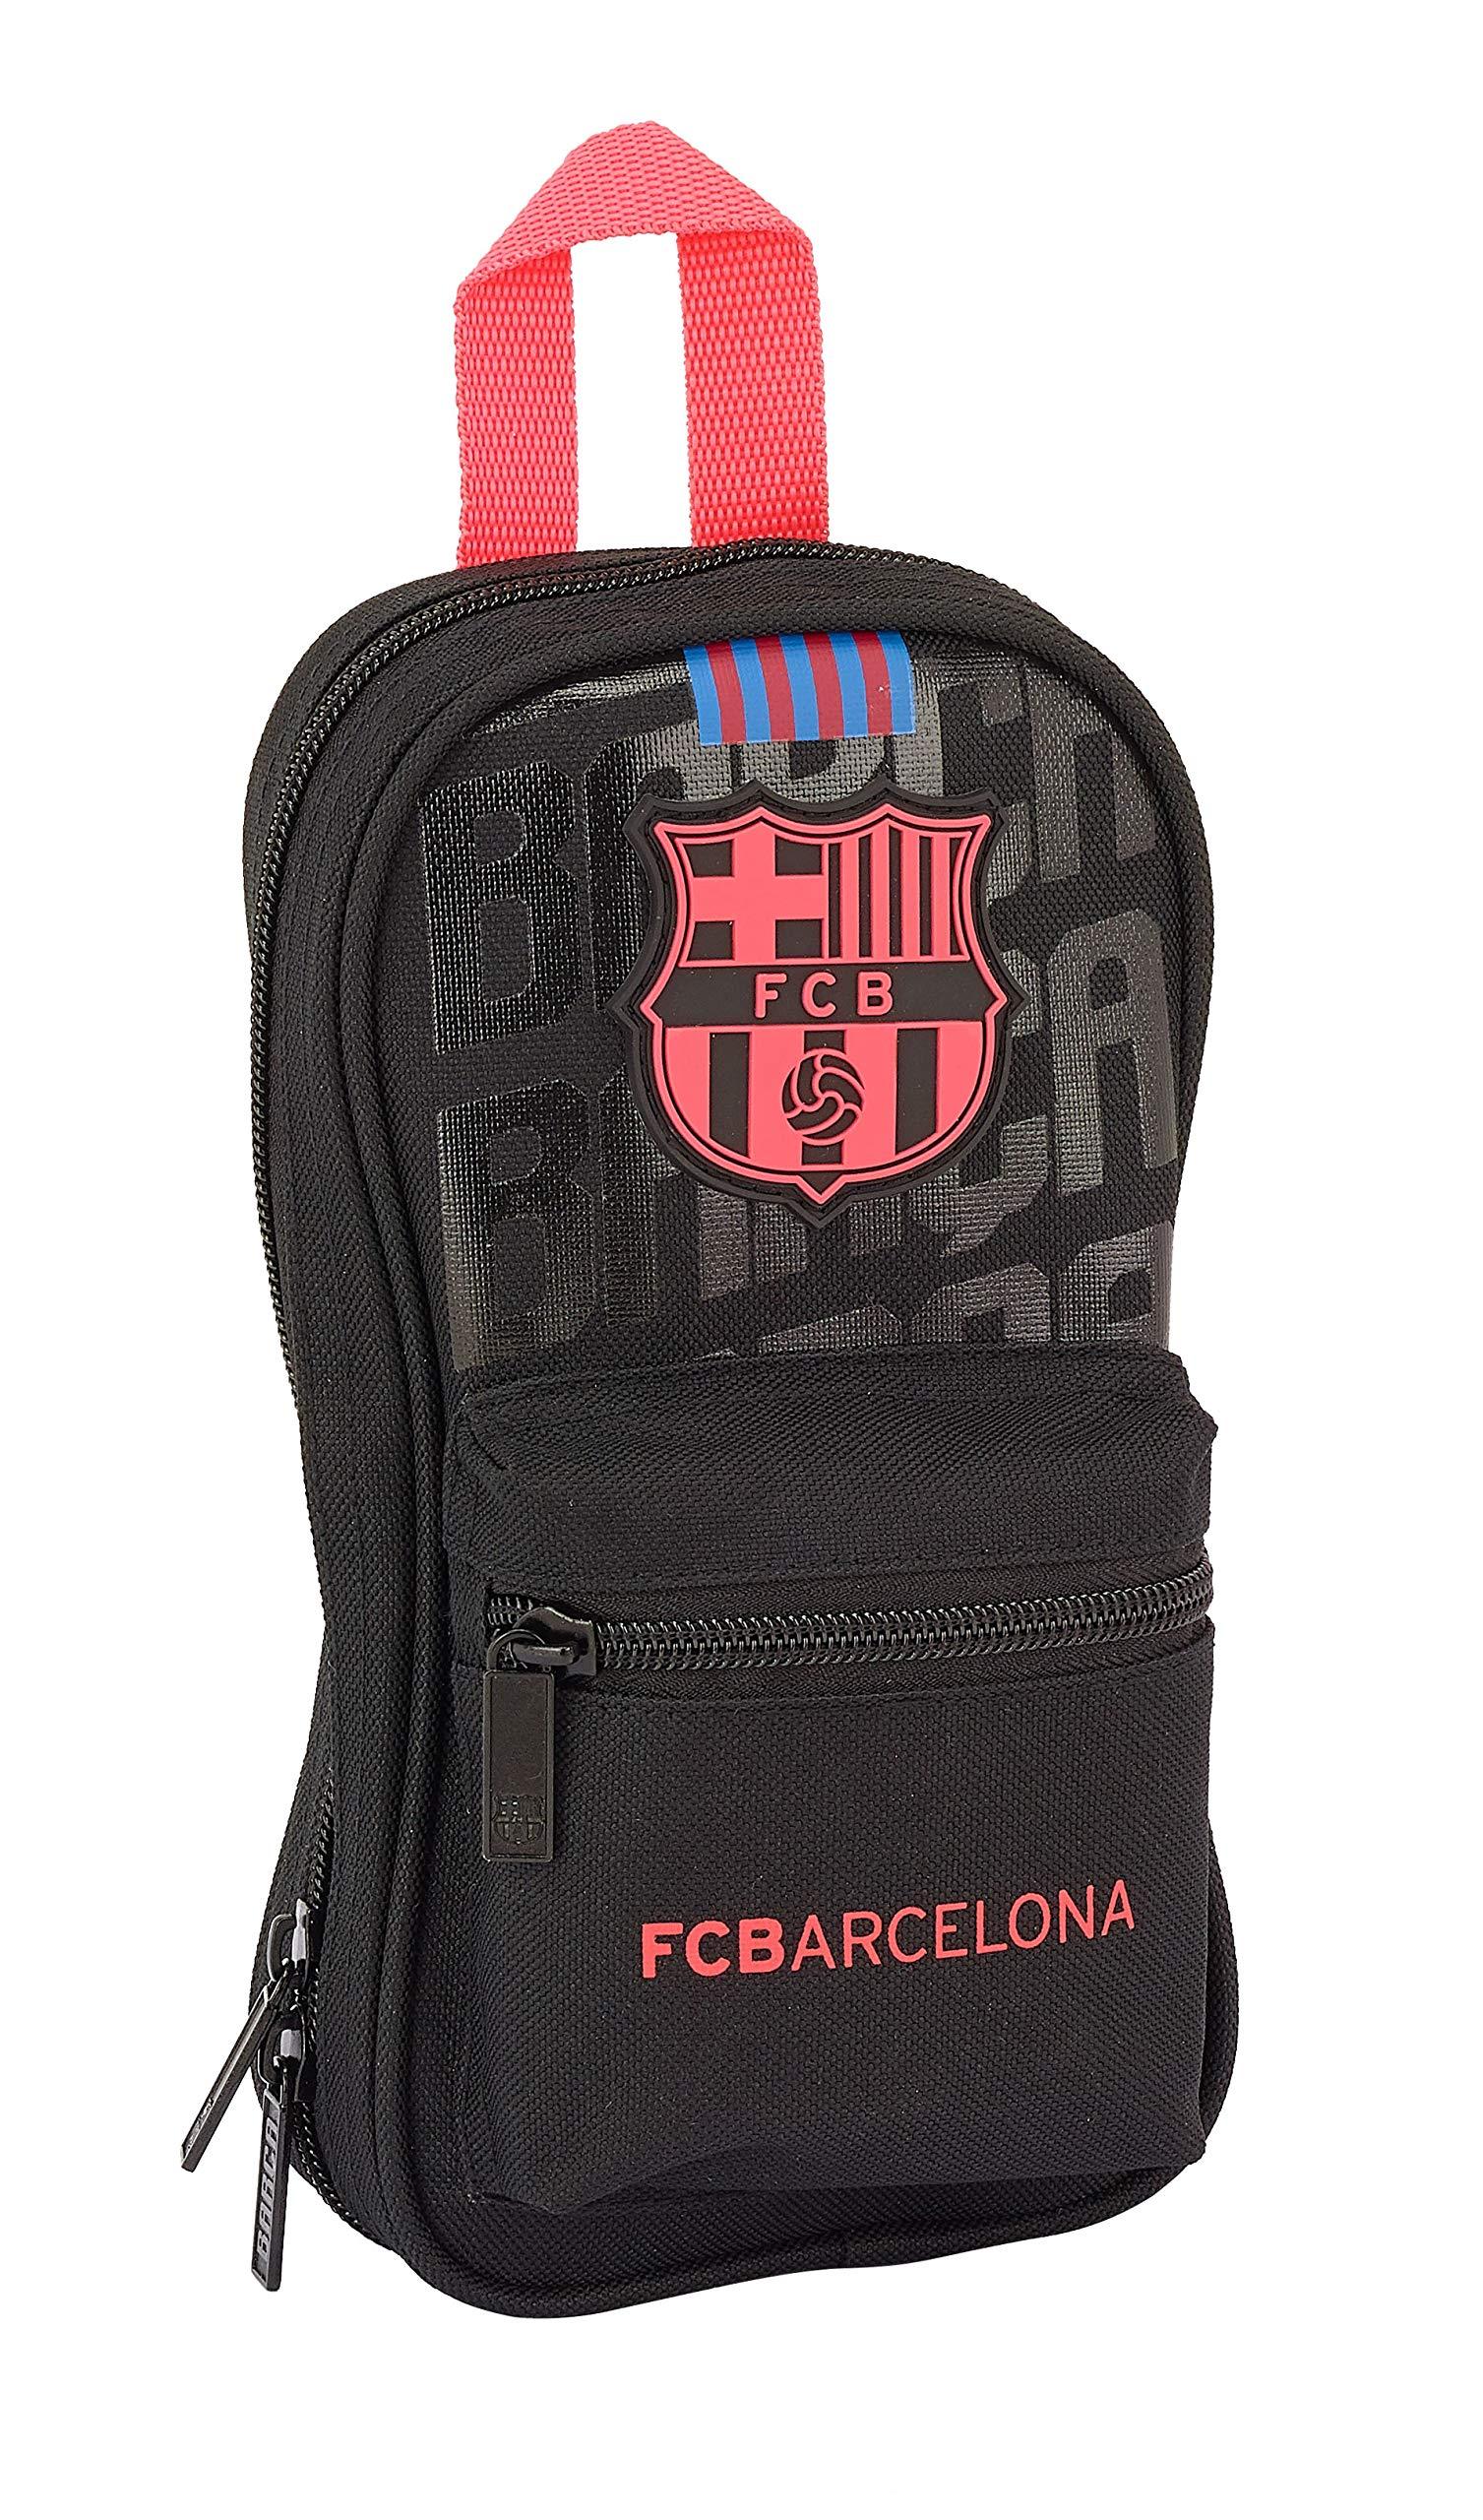 Fc barcelona plumier mochila con 4 port; llenos f.c.bar 12x23x5 color azul 23 cm 411927747.